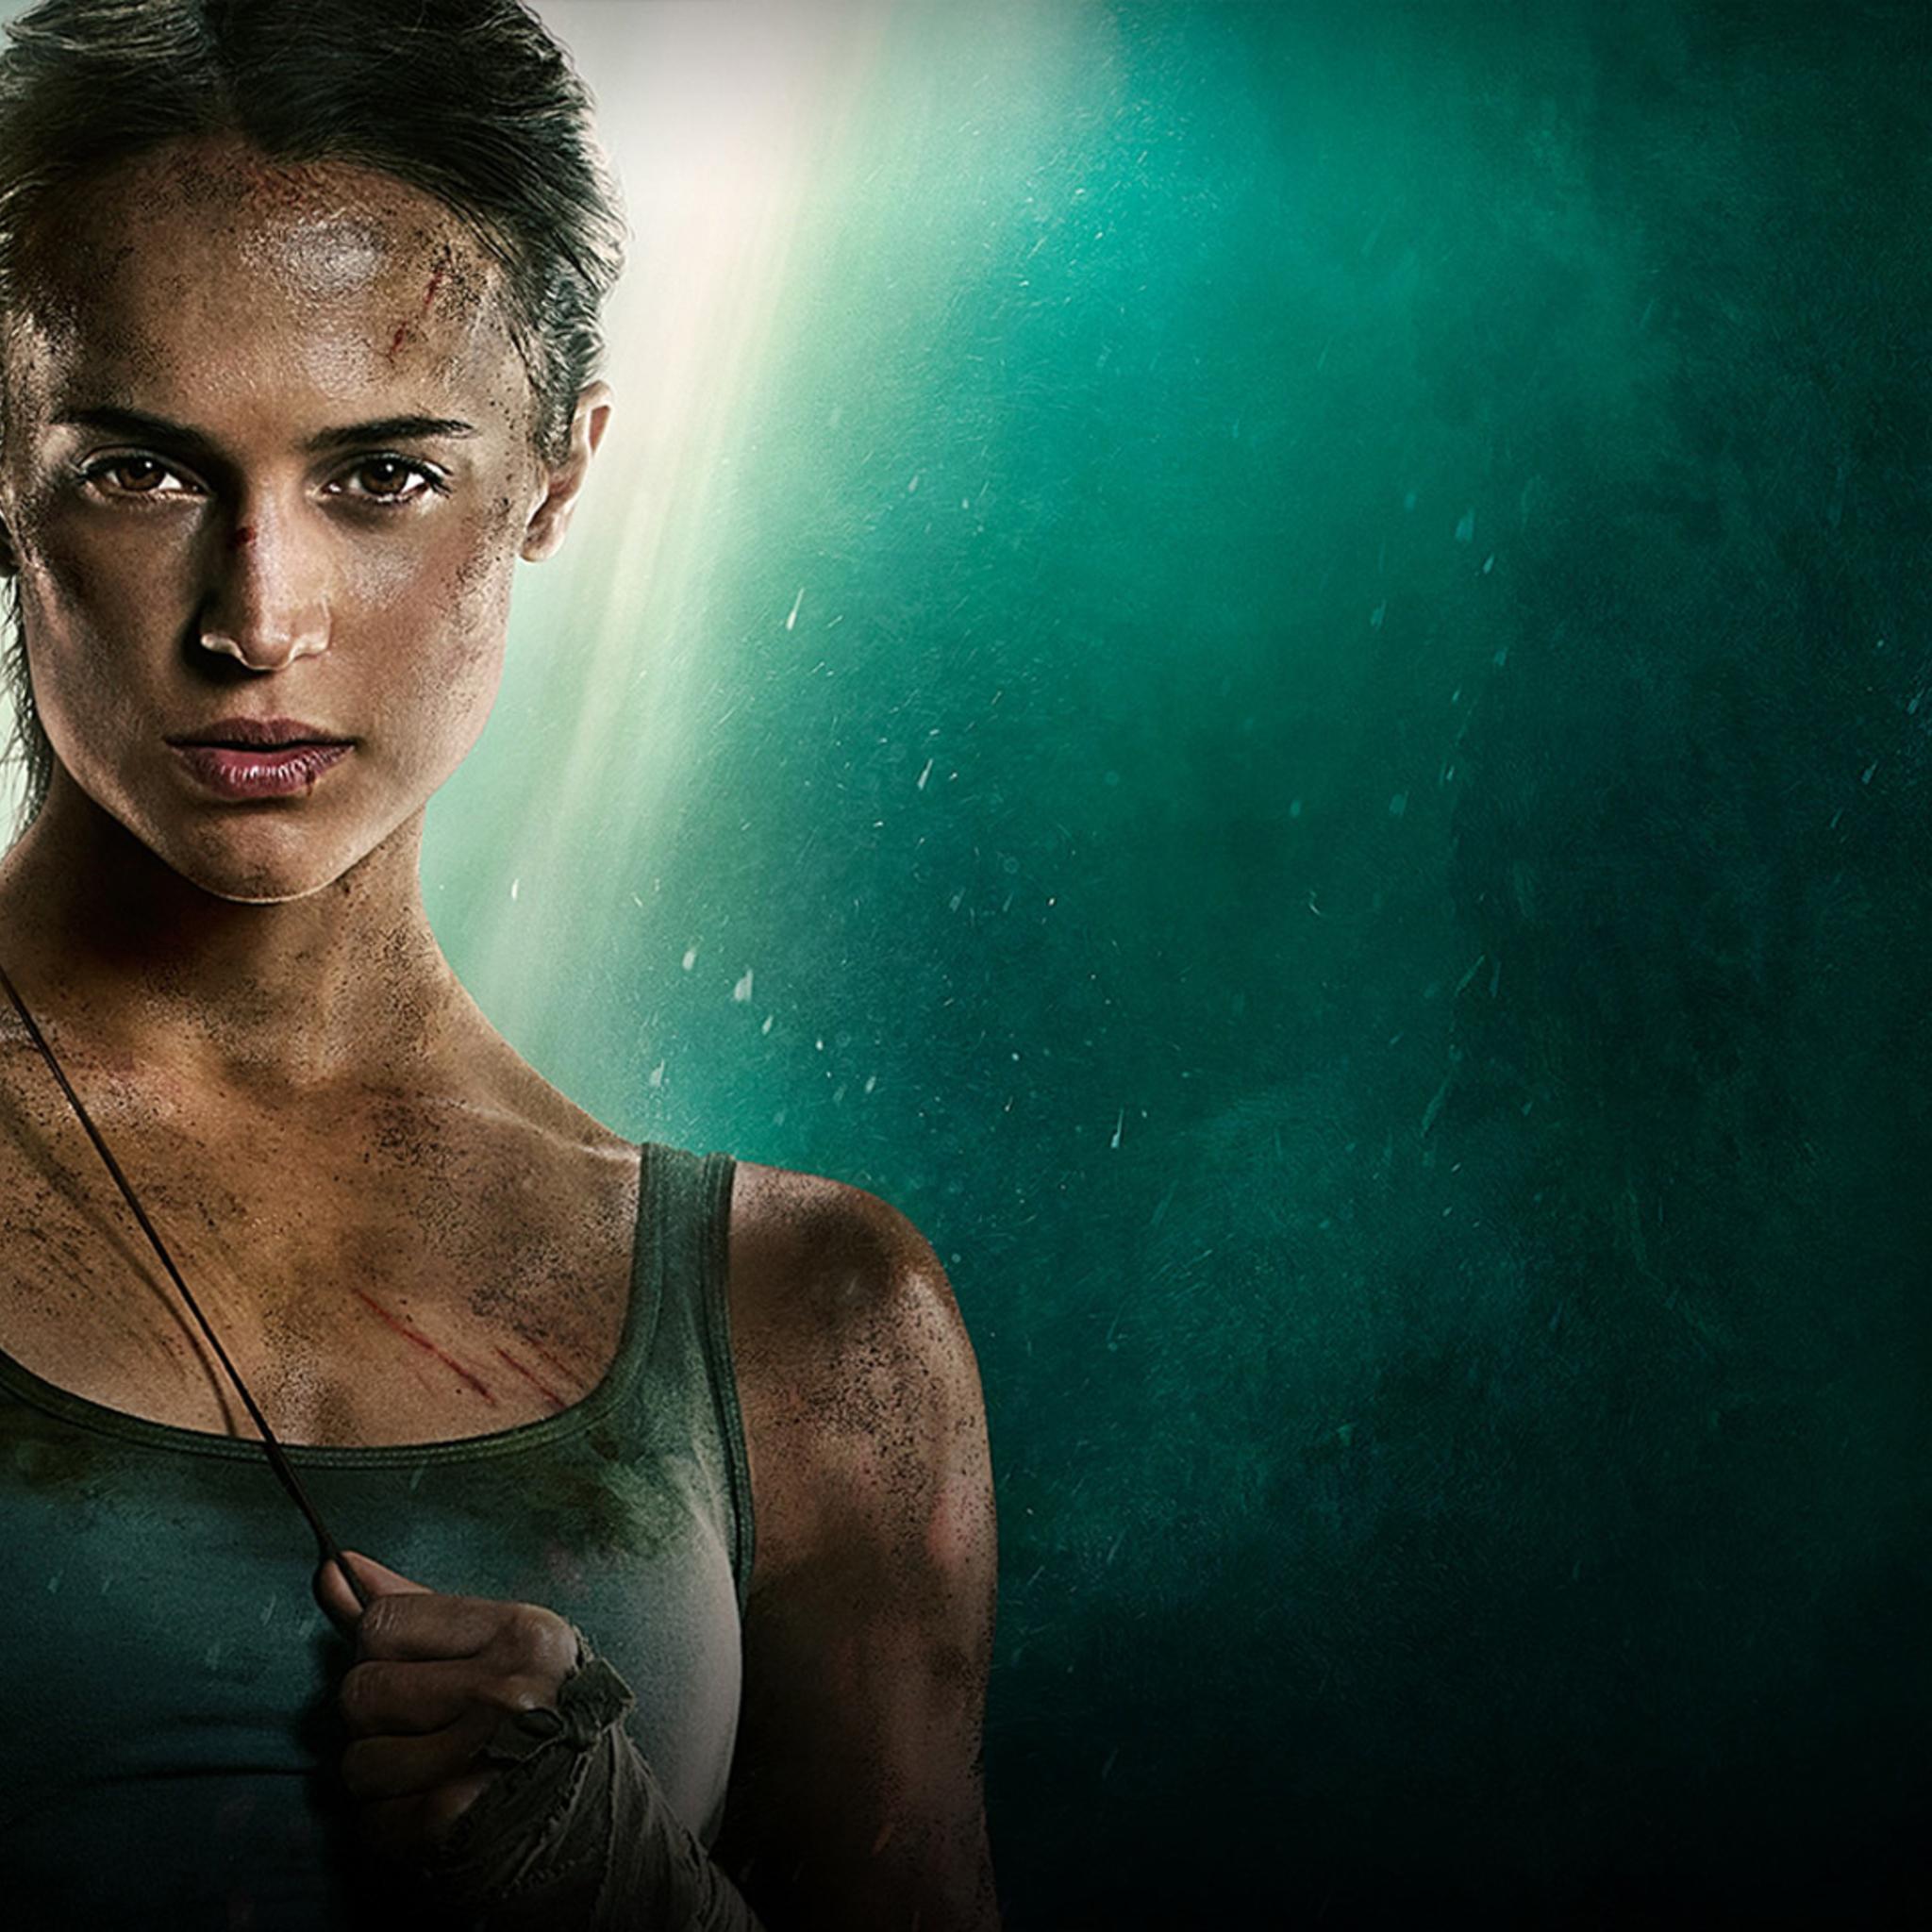 Wallpaper Tomb Raider 2018: 2048x2048 Tomb Raider 2018 Movie Alicia Vikander Poster